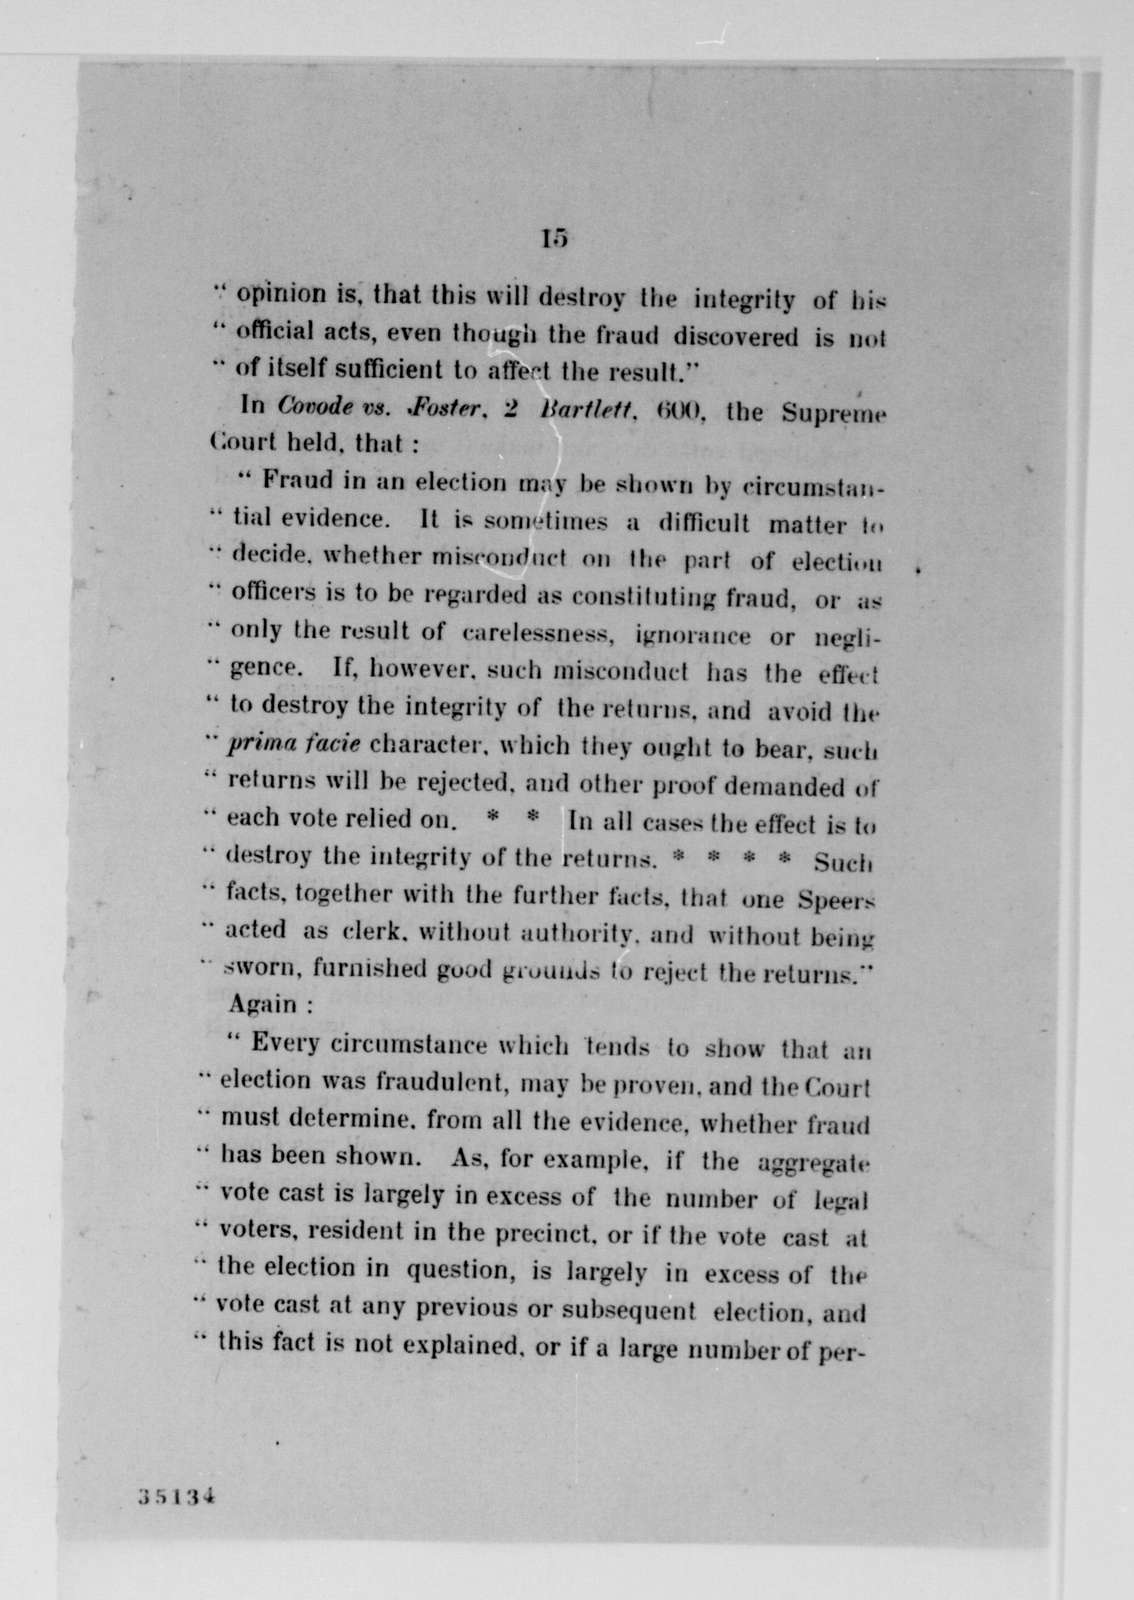 James A. Garfield Papers: Series 4, General Correspondence, 1852-1882; Vol. 67, 1880, Jan. 28-30